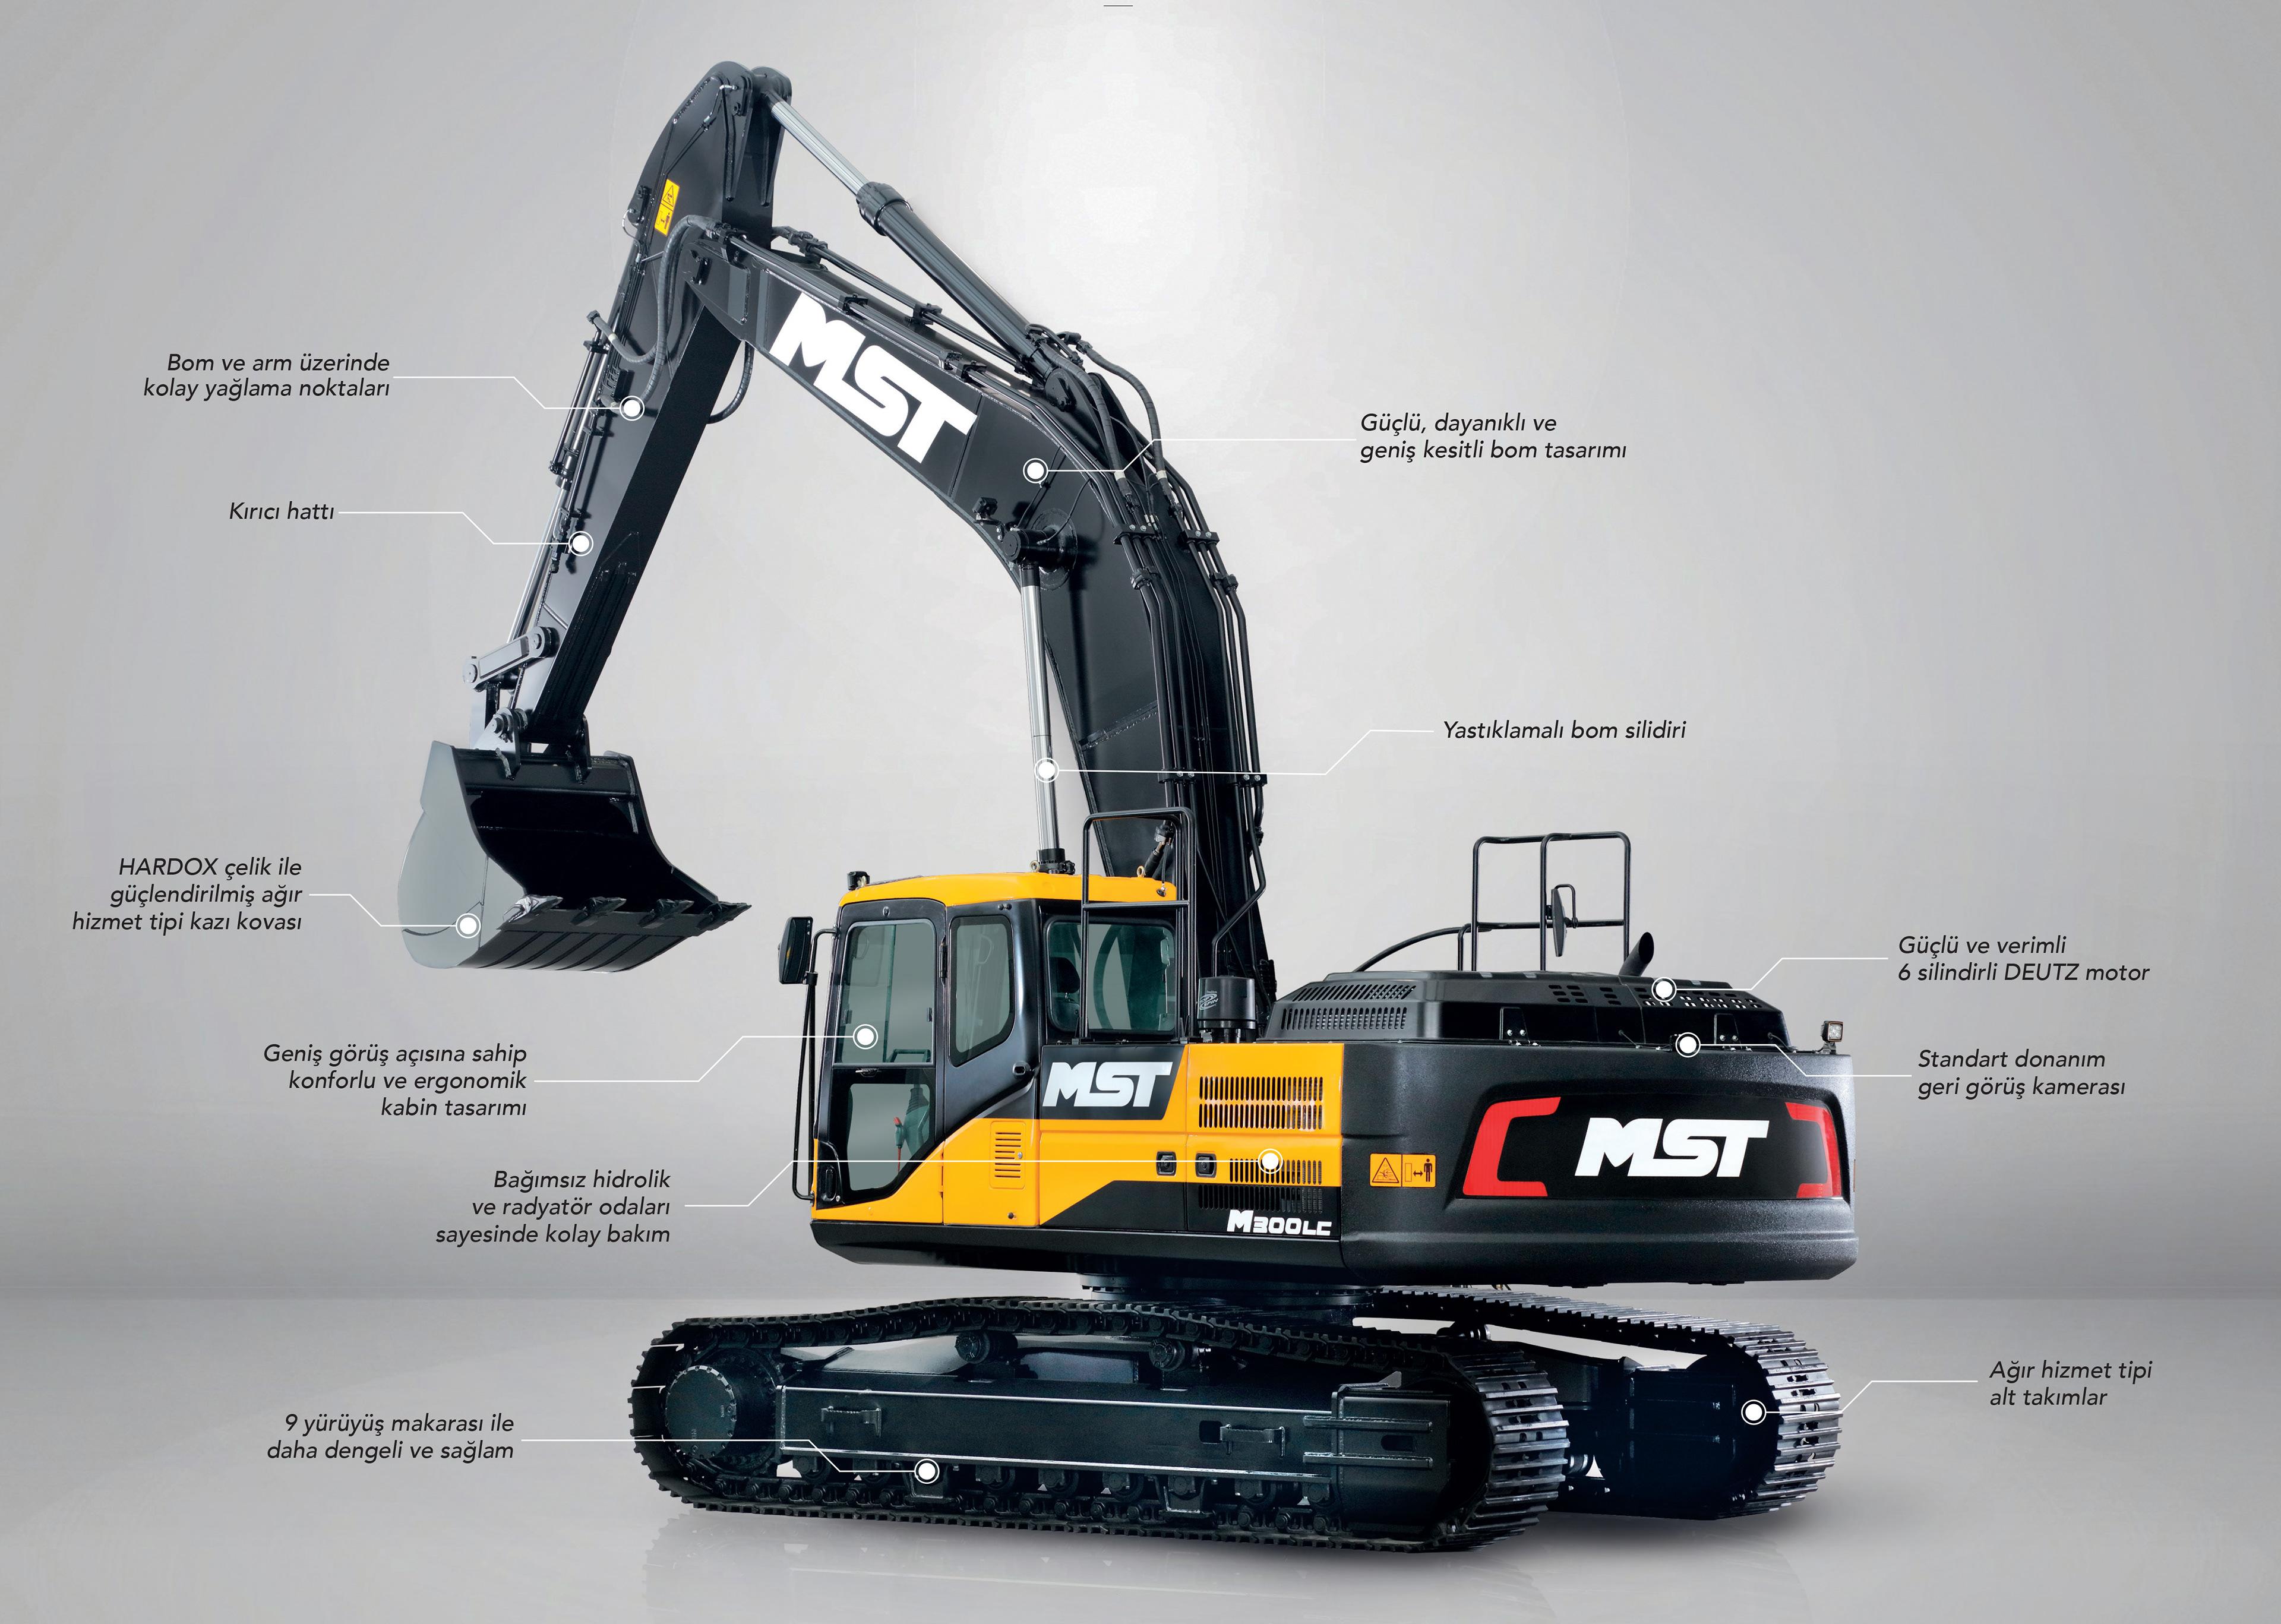 MST macchine movimento terra D56cebf1-54b3-4ce5-9ffc-9f1ea1ce943e_rw_3840